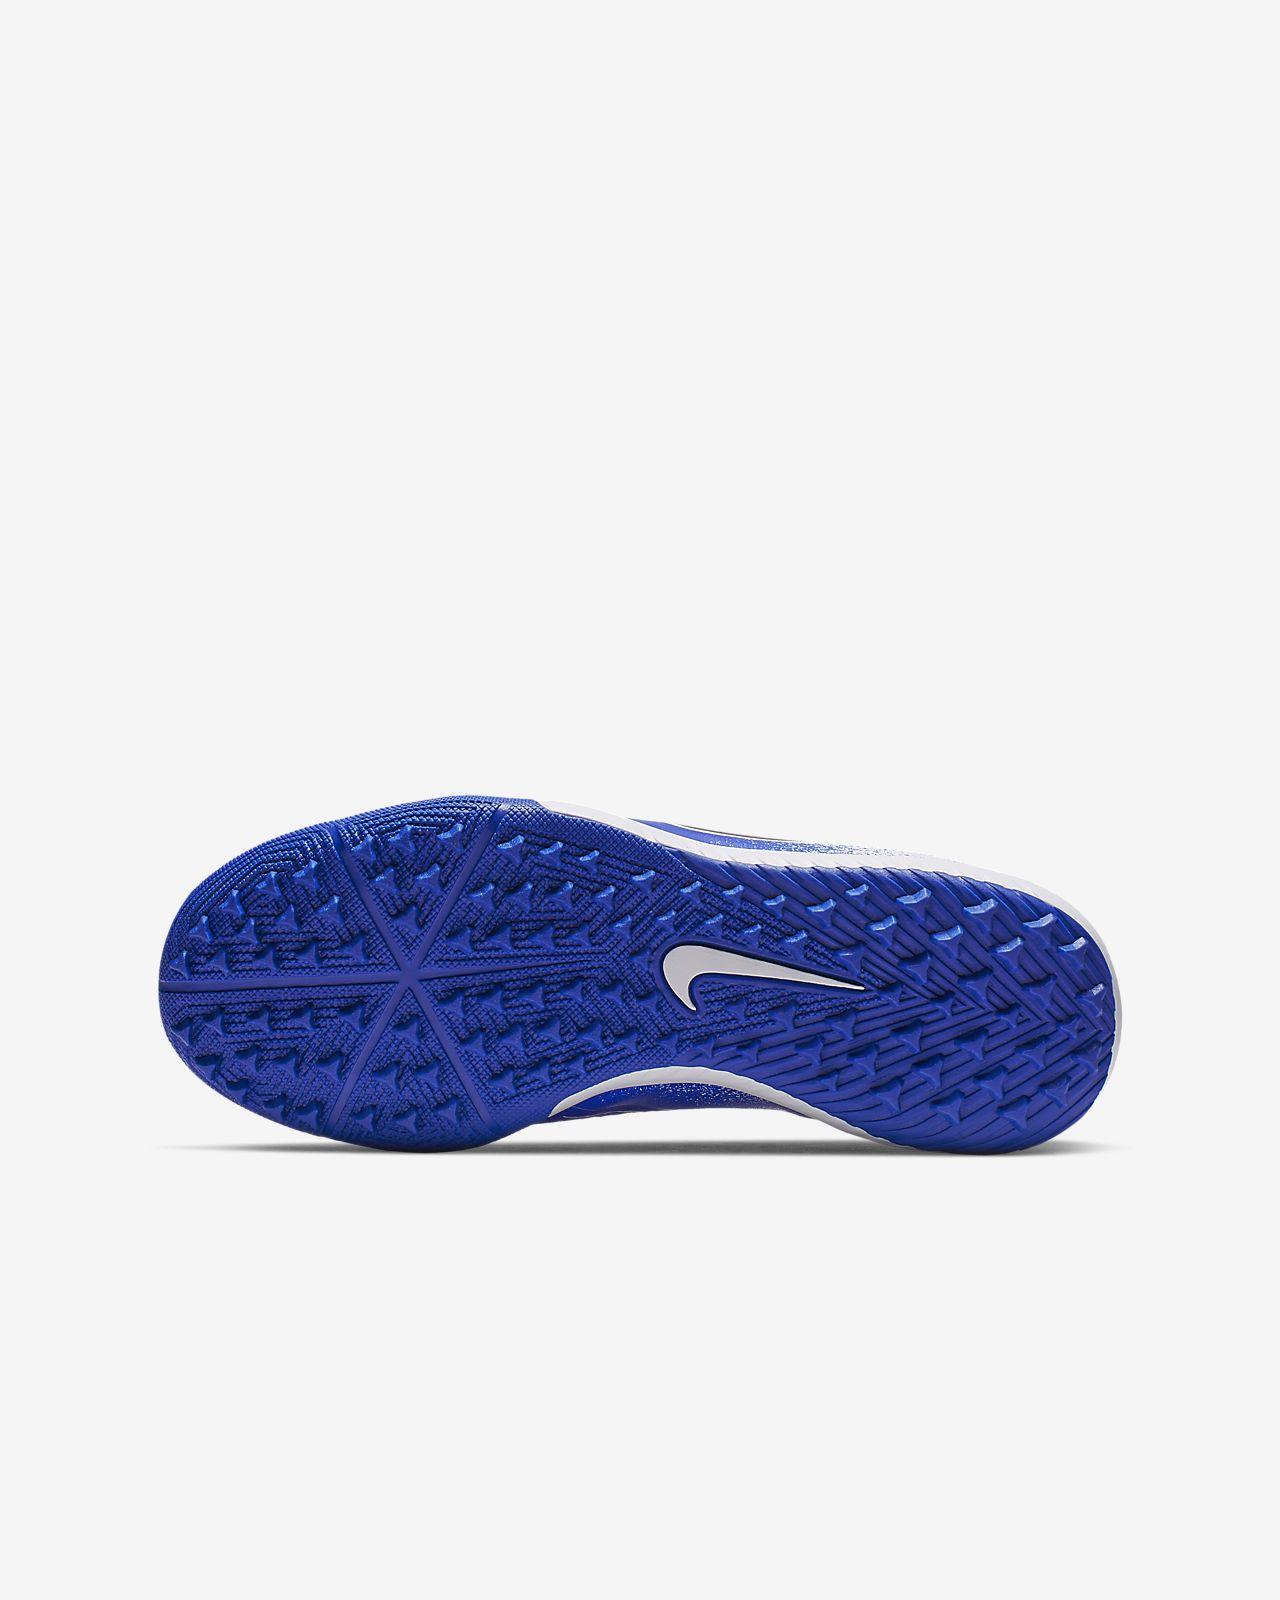 promo code a18de e5d32 ... Nike Jr. Phantom Venom Academy TF Fußballschuh für Turf für  jüngere ältere Kinder